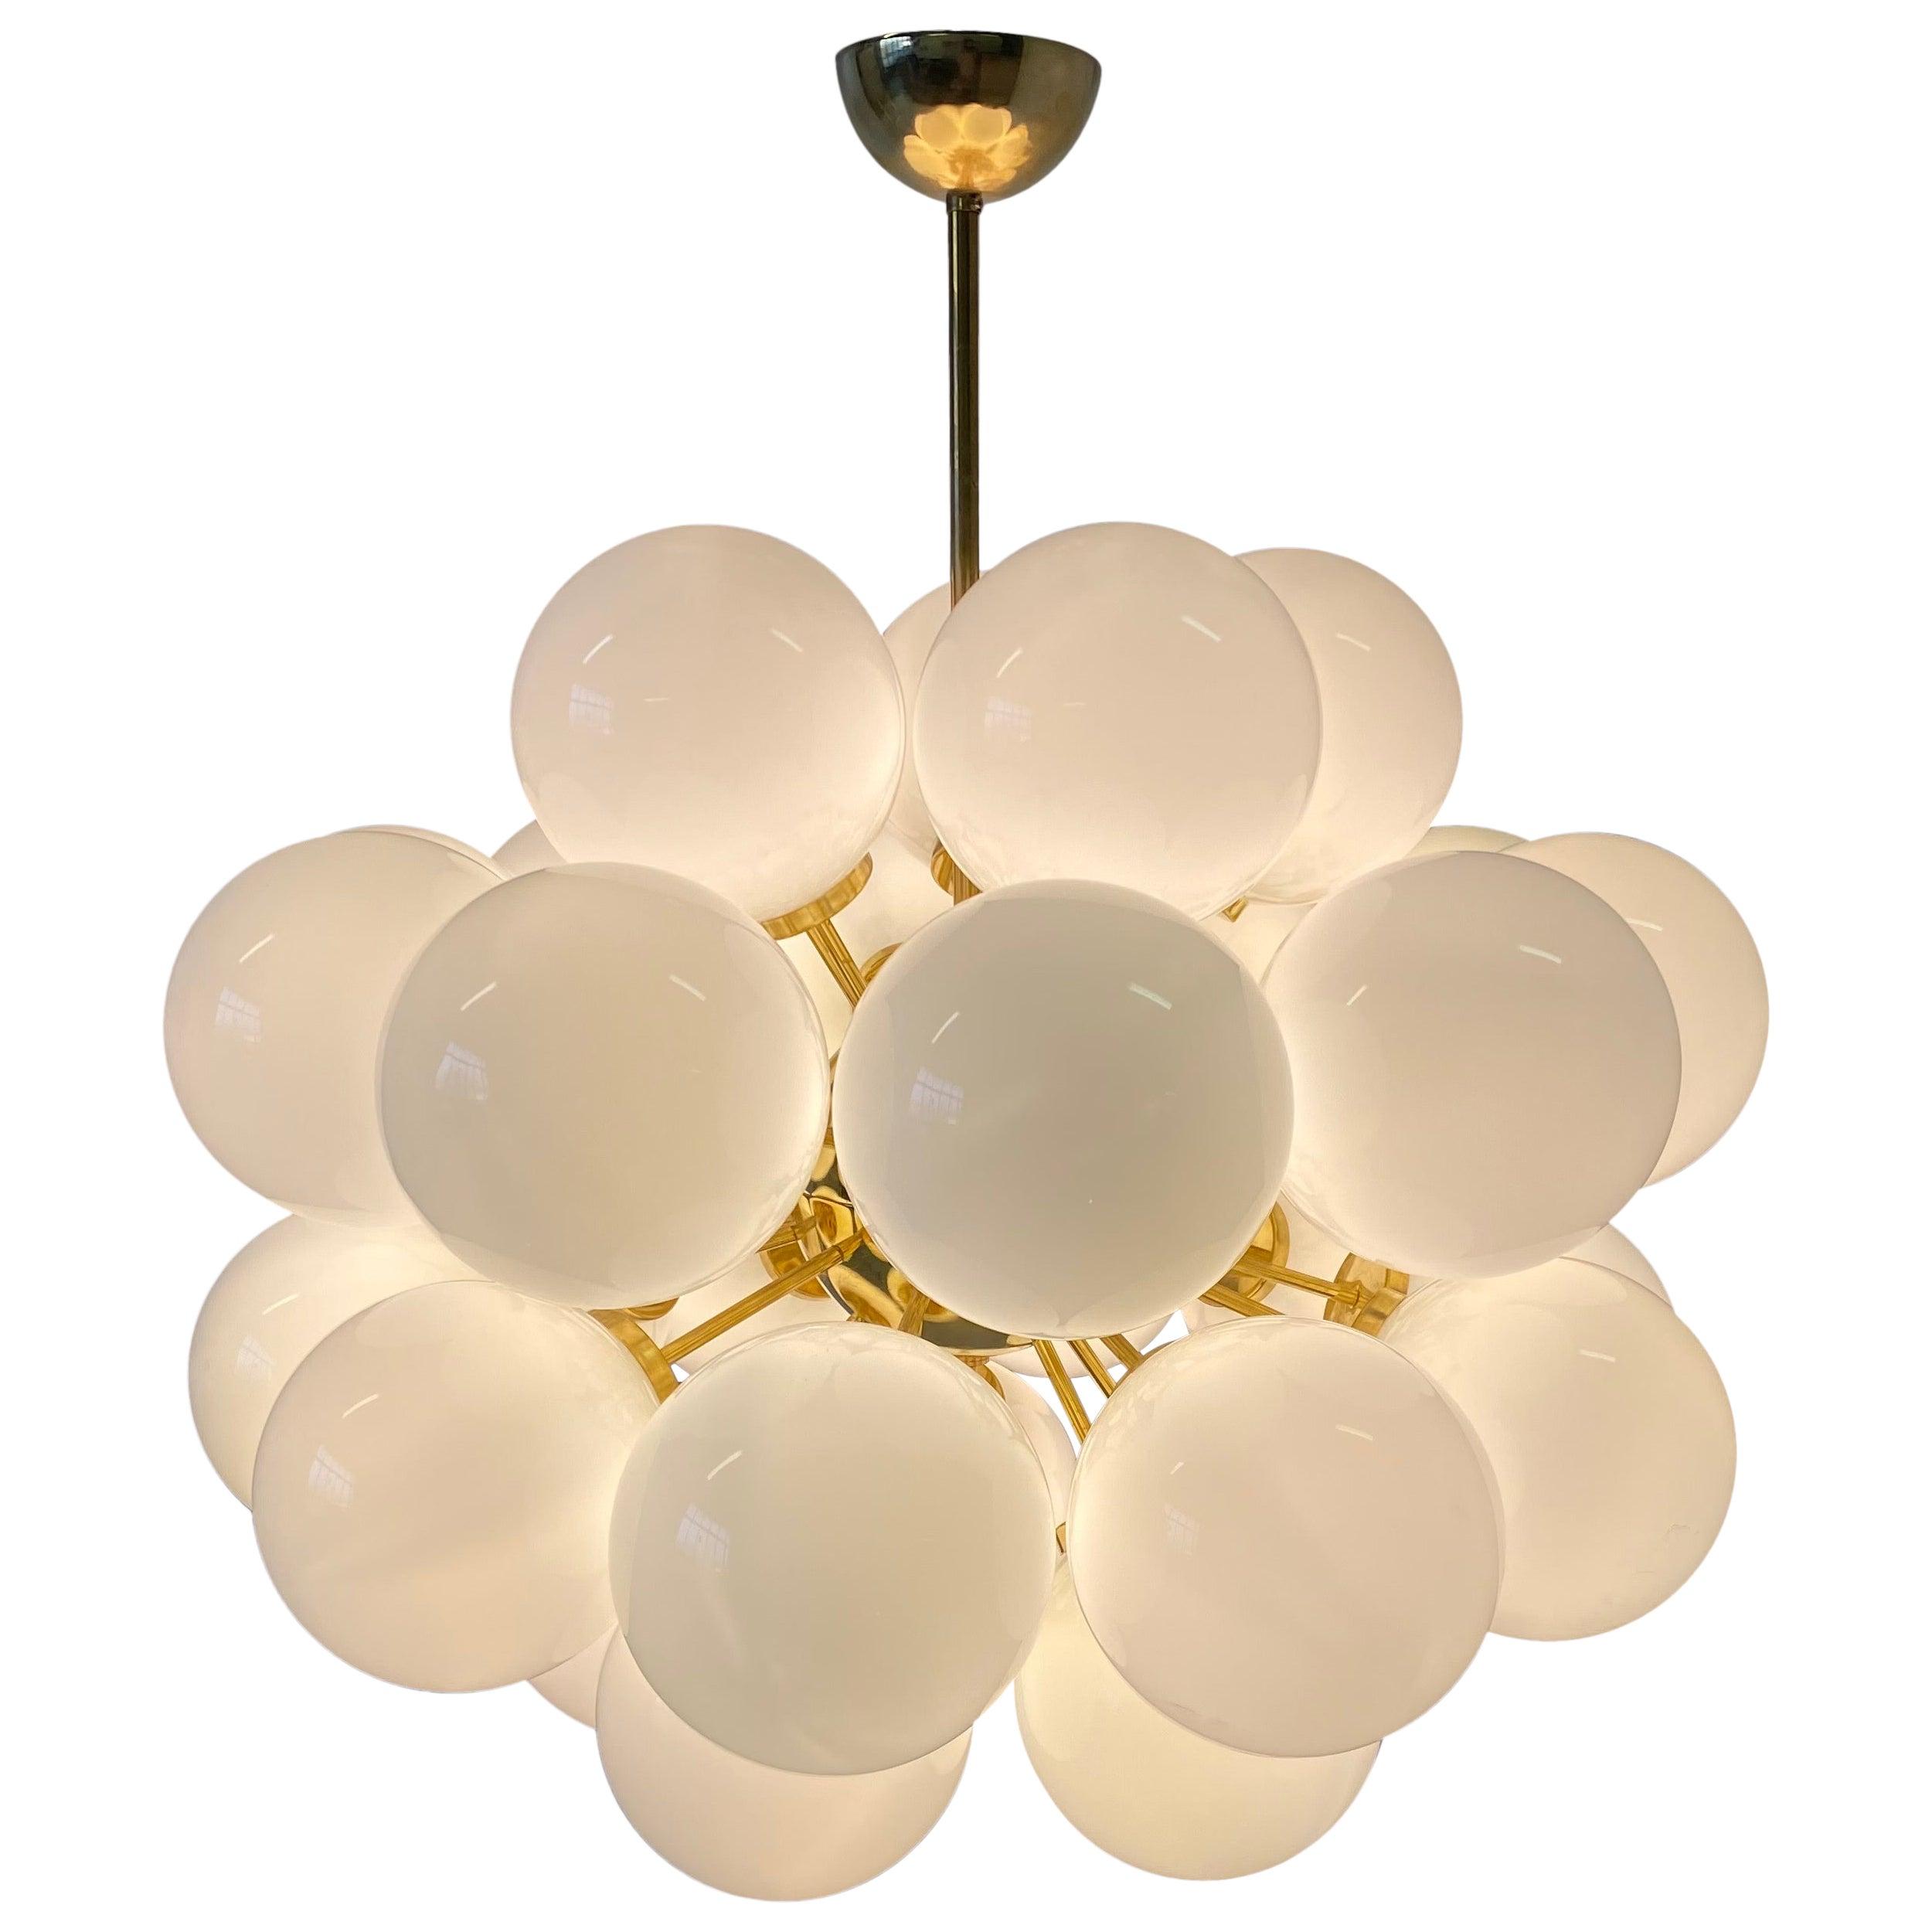 Mid-Century Modern Brass and White Murano Glass Spheres Chandelier